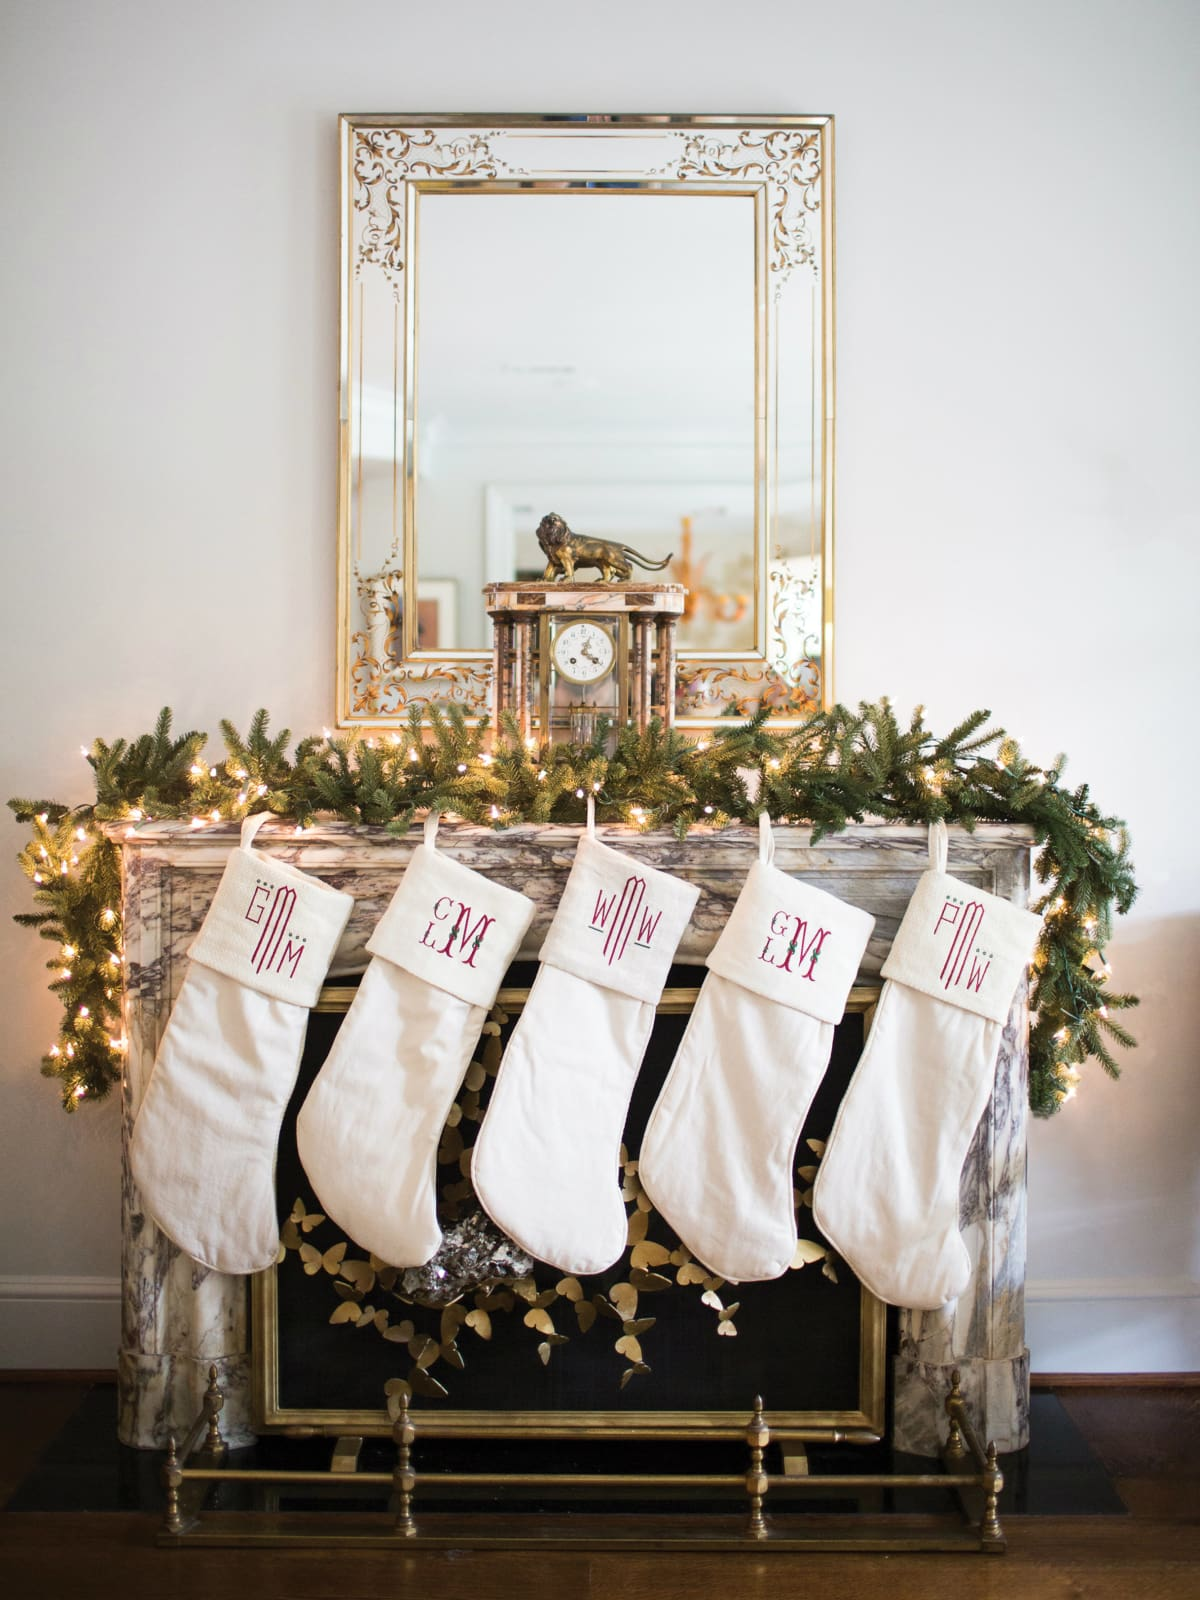 Monogrammed stockings